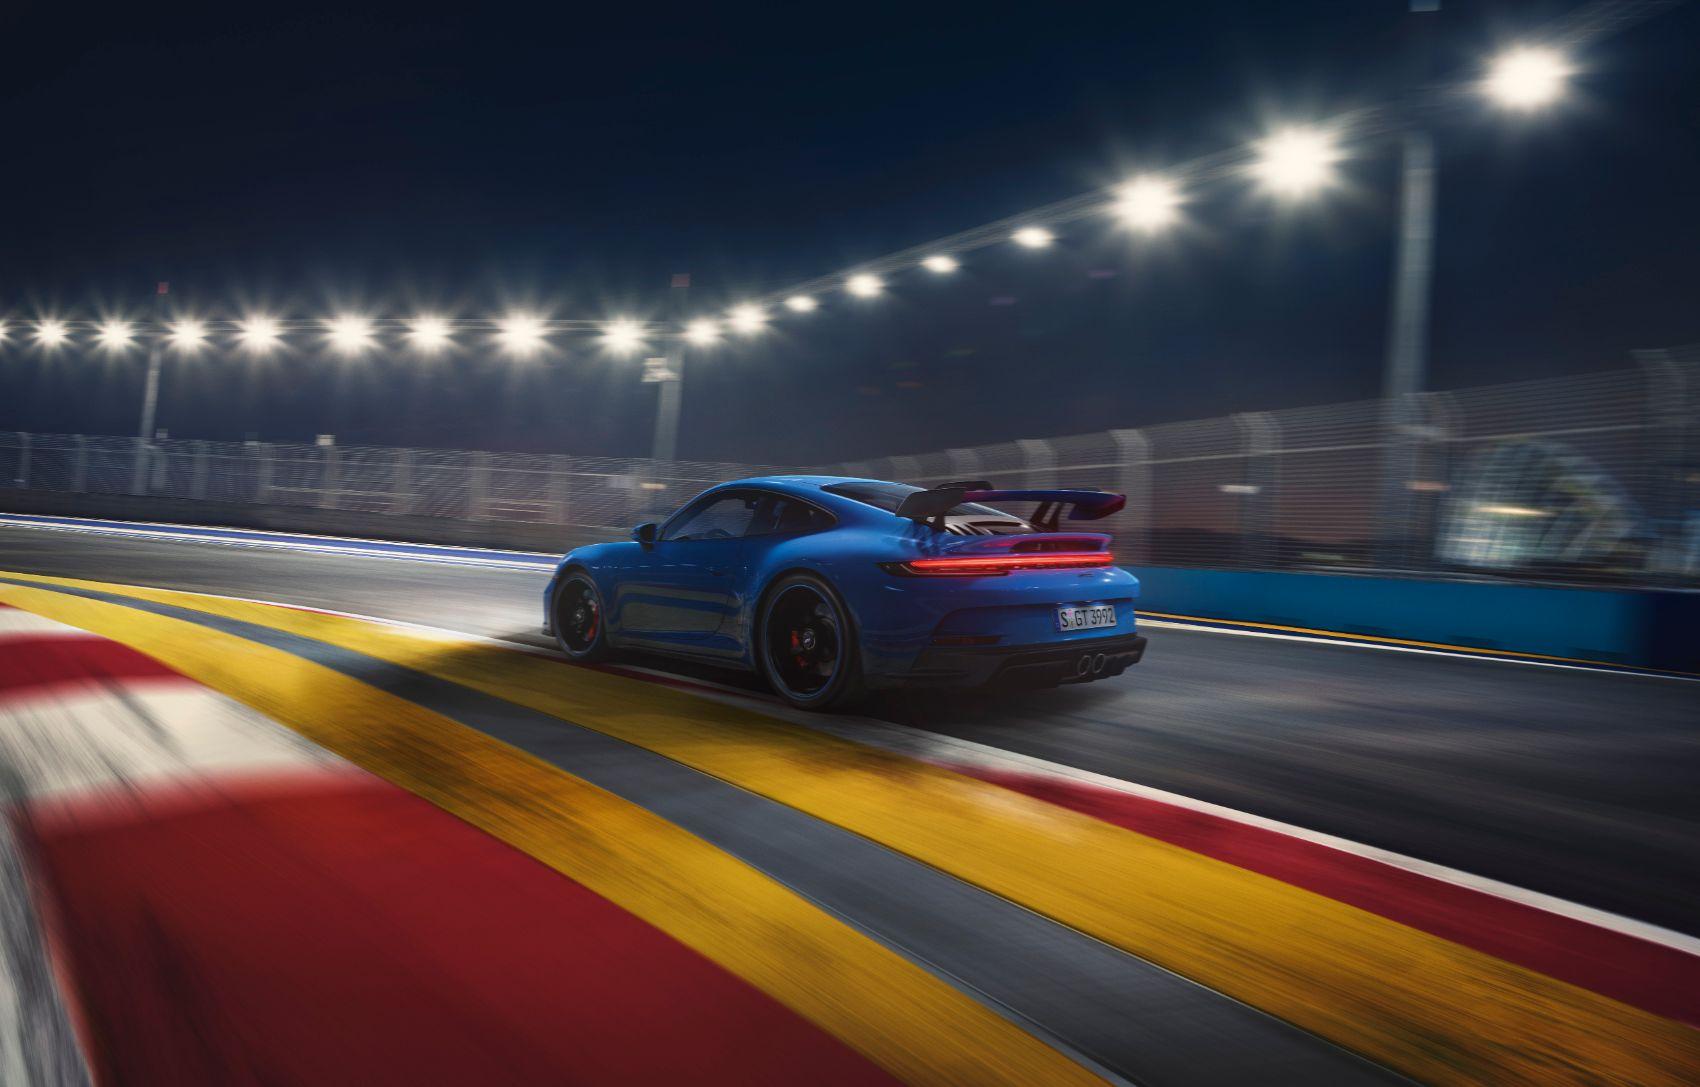 2022 Porsche 911 GT3: Powertrain Specs, Aerodynamics, Interior Features & More